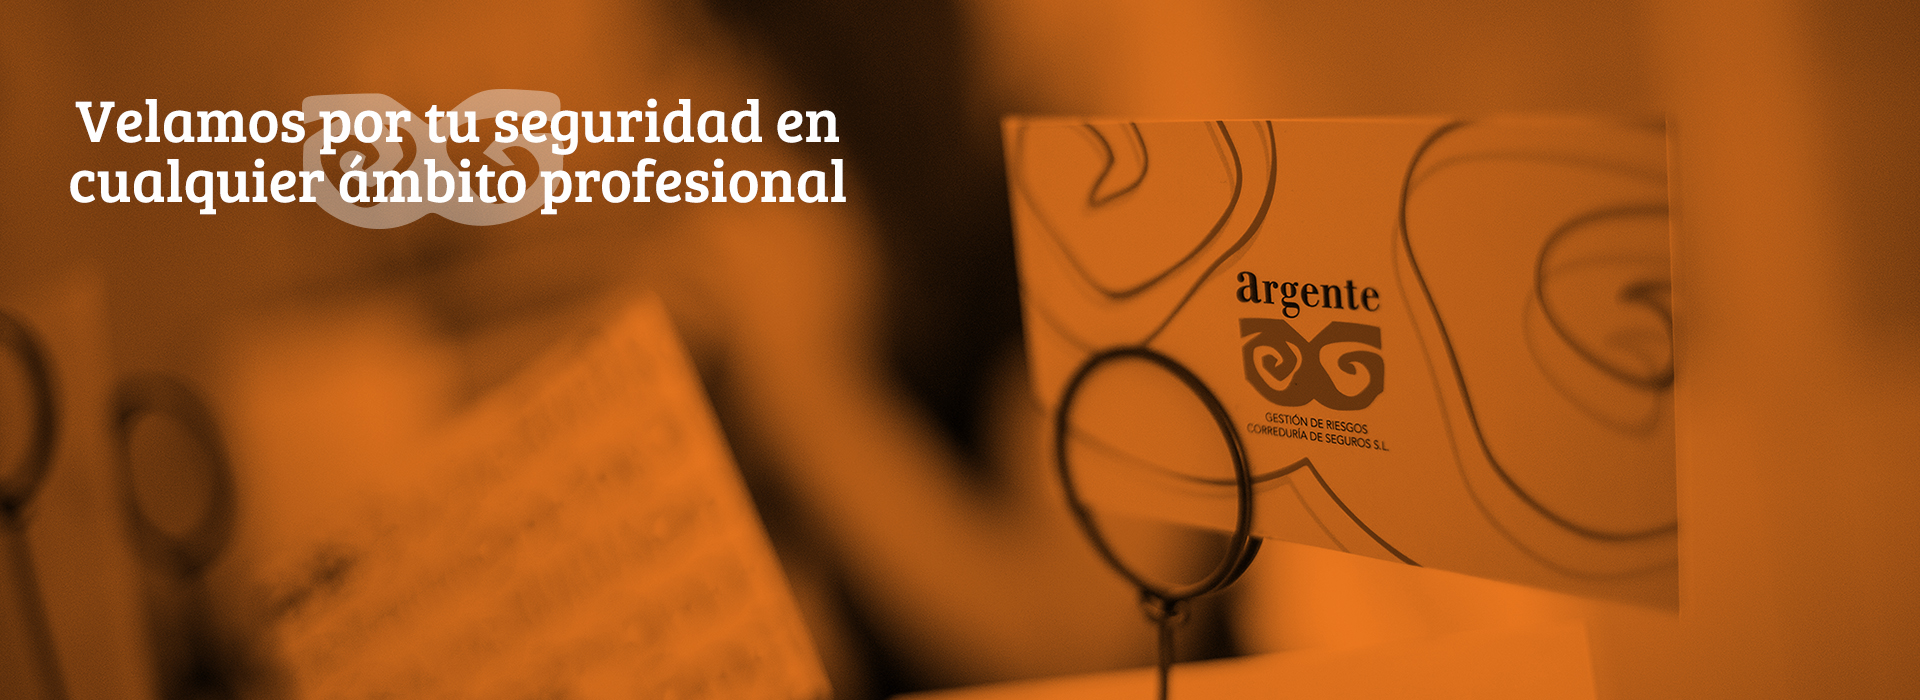 argente-correduria-de-seguros-en-valencia